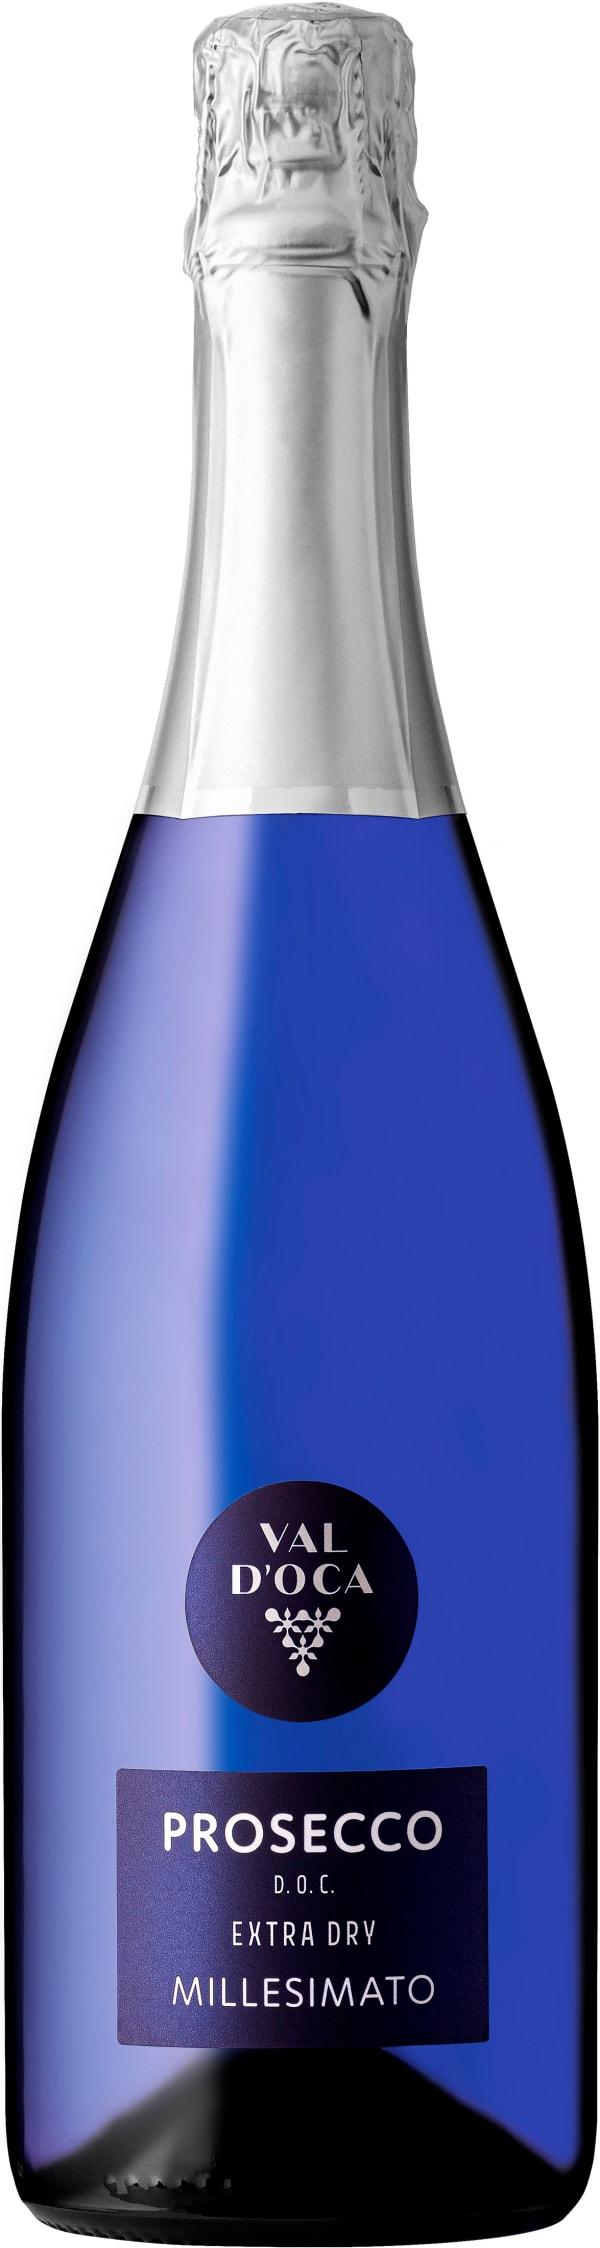 Val d'Oca Millesimato Prosecco Extra Dry 2018